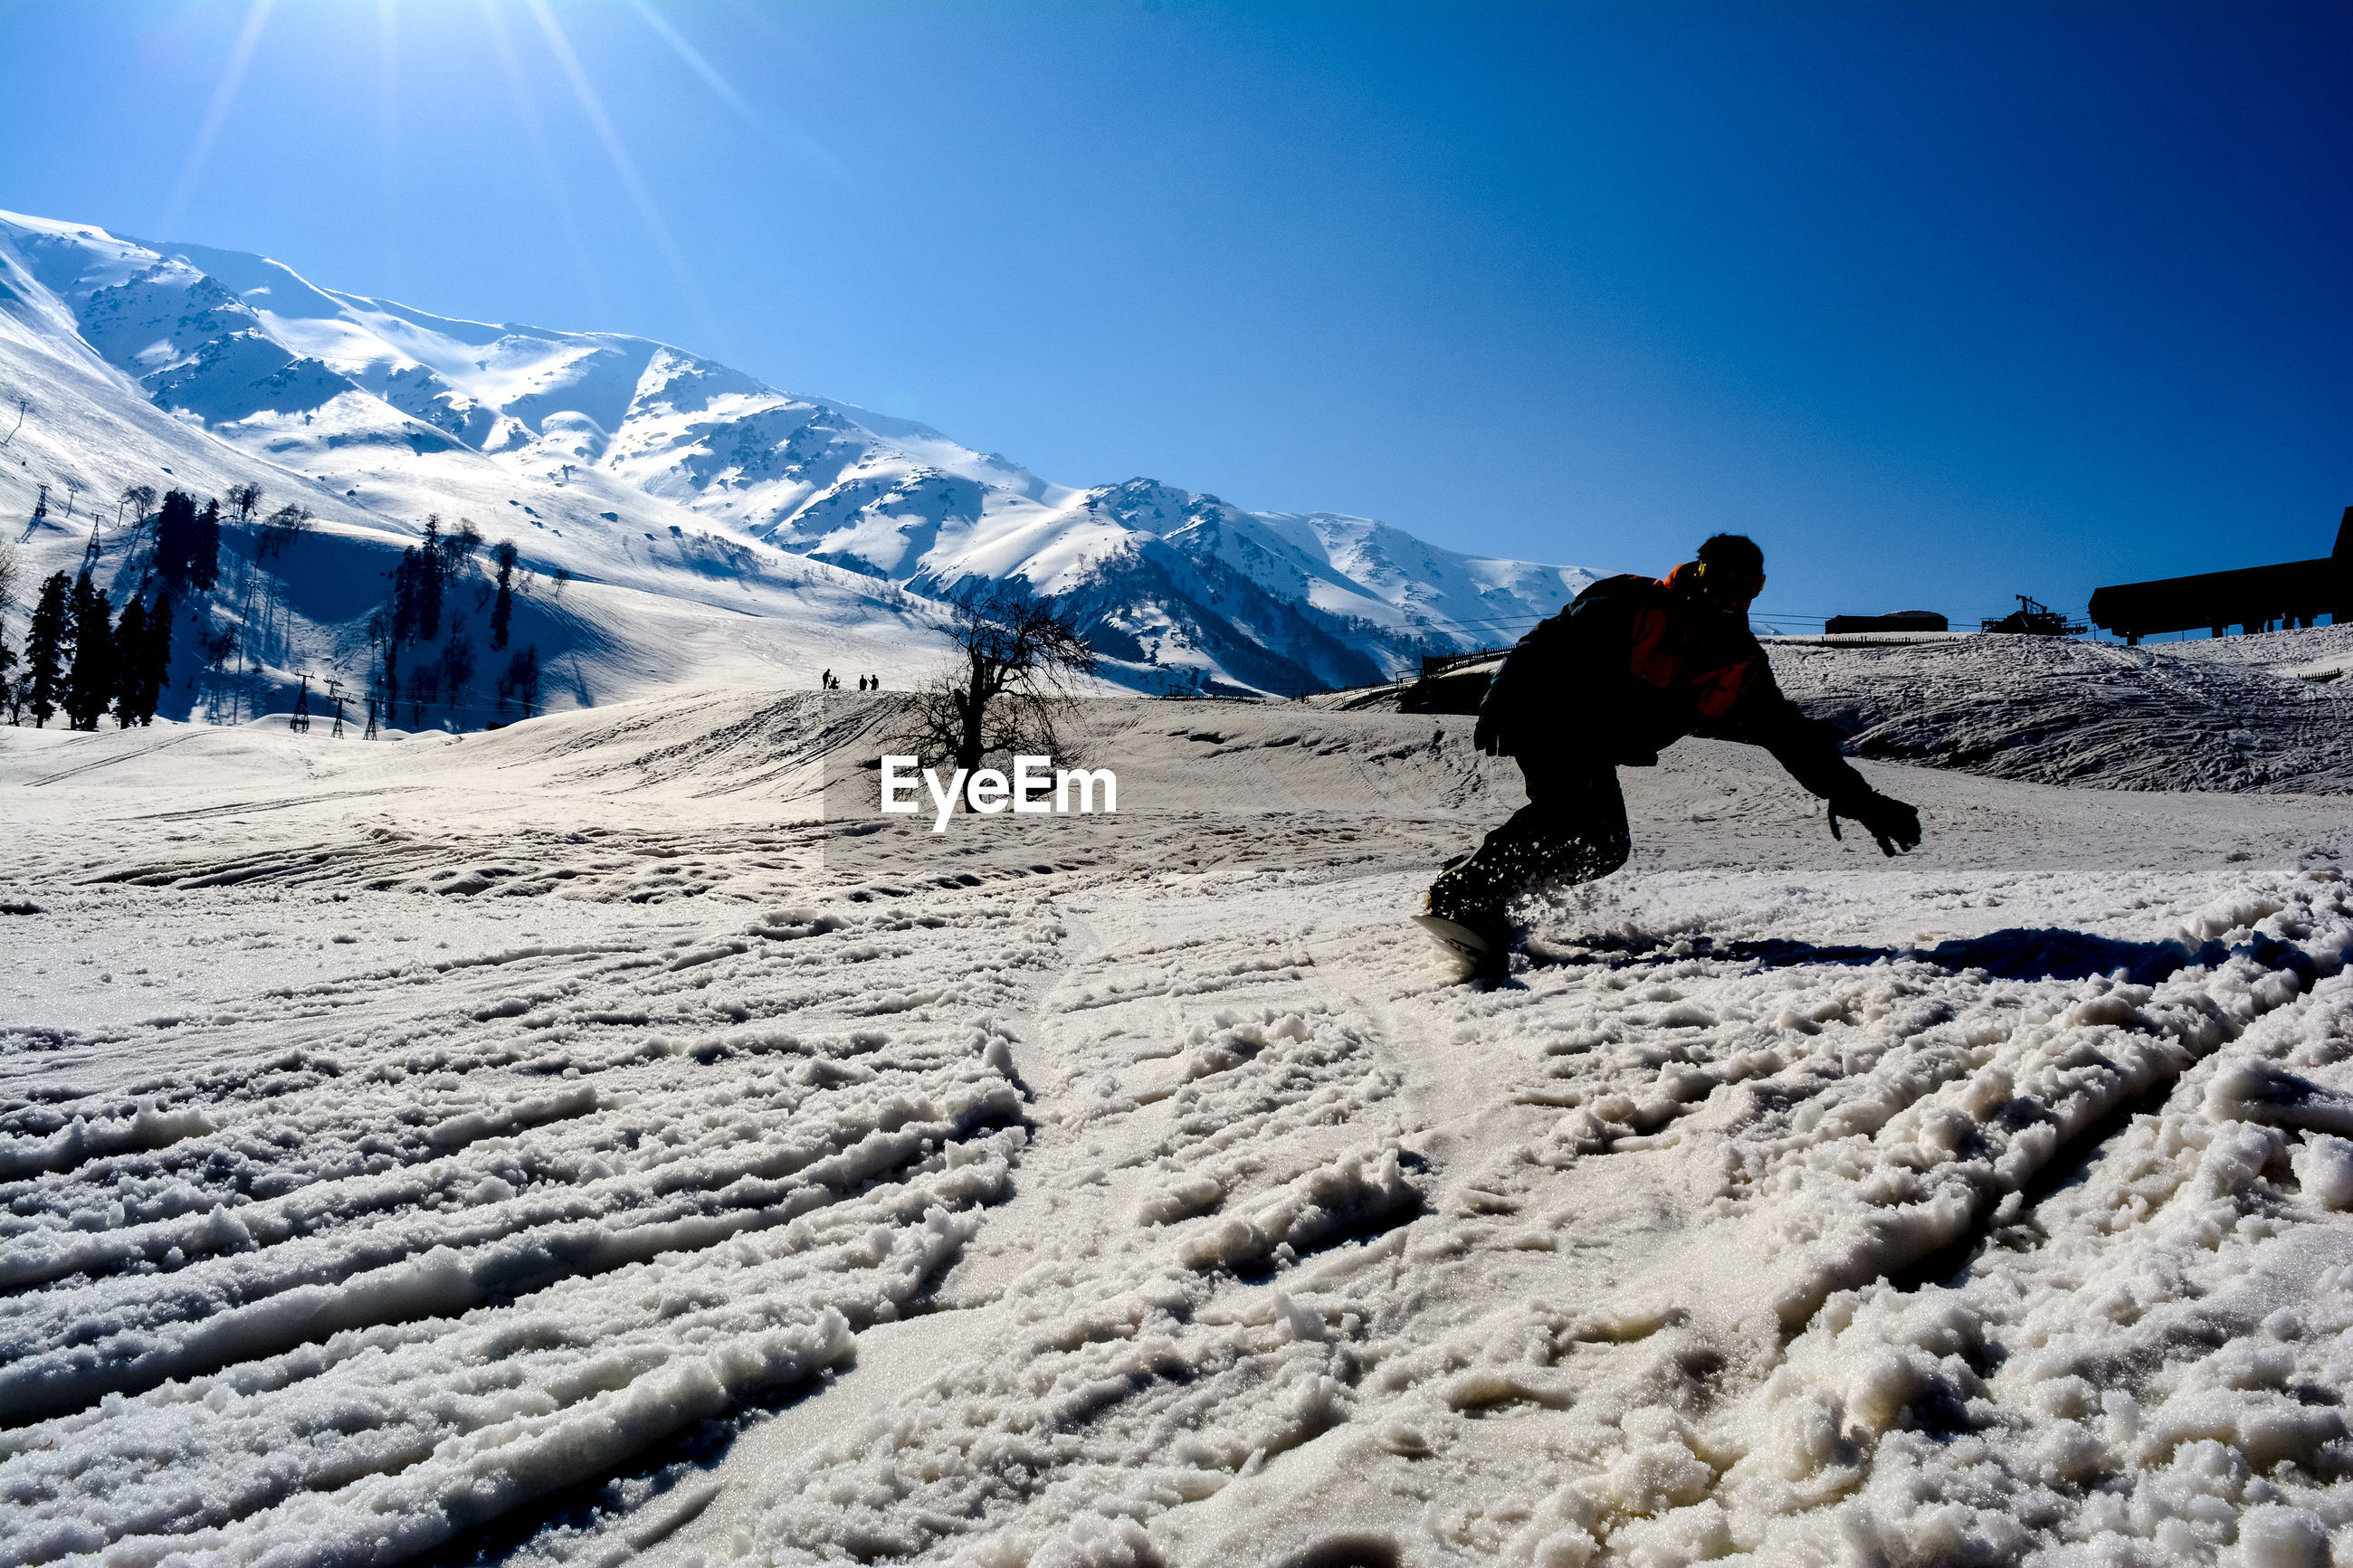 Man snowboarding on mountain against blue sky